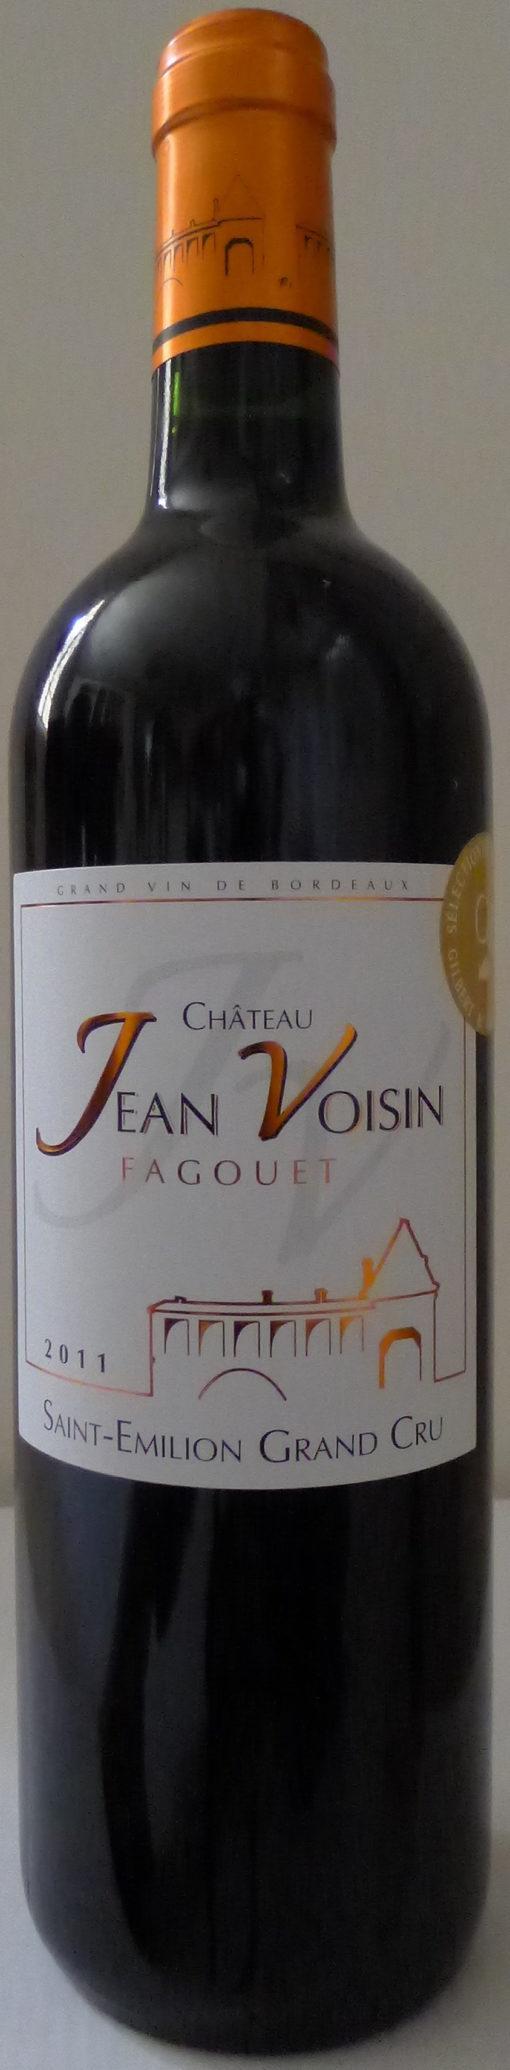 Covigneron Jean Voisin Fagouet 2011